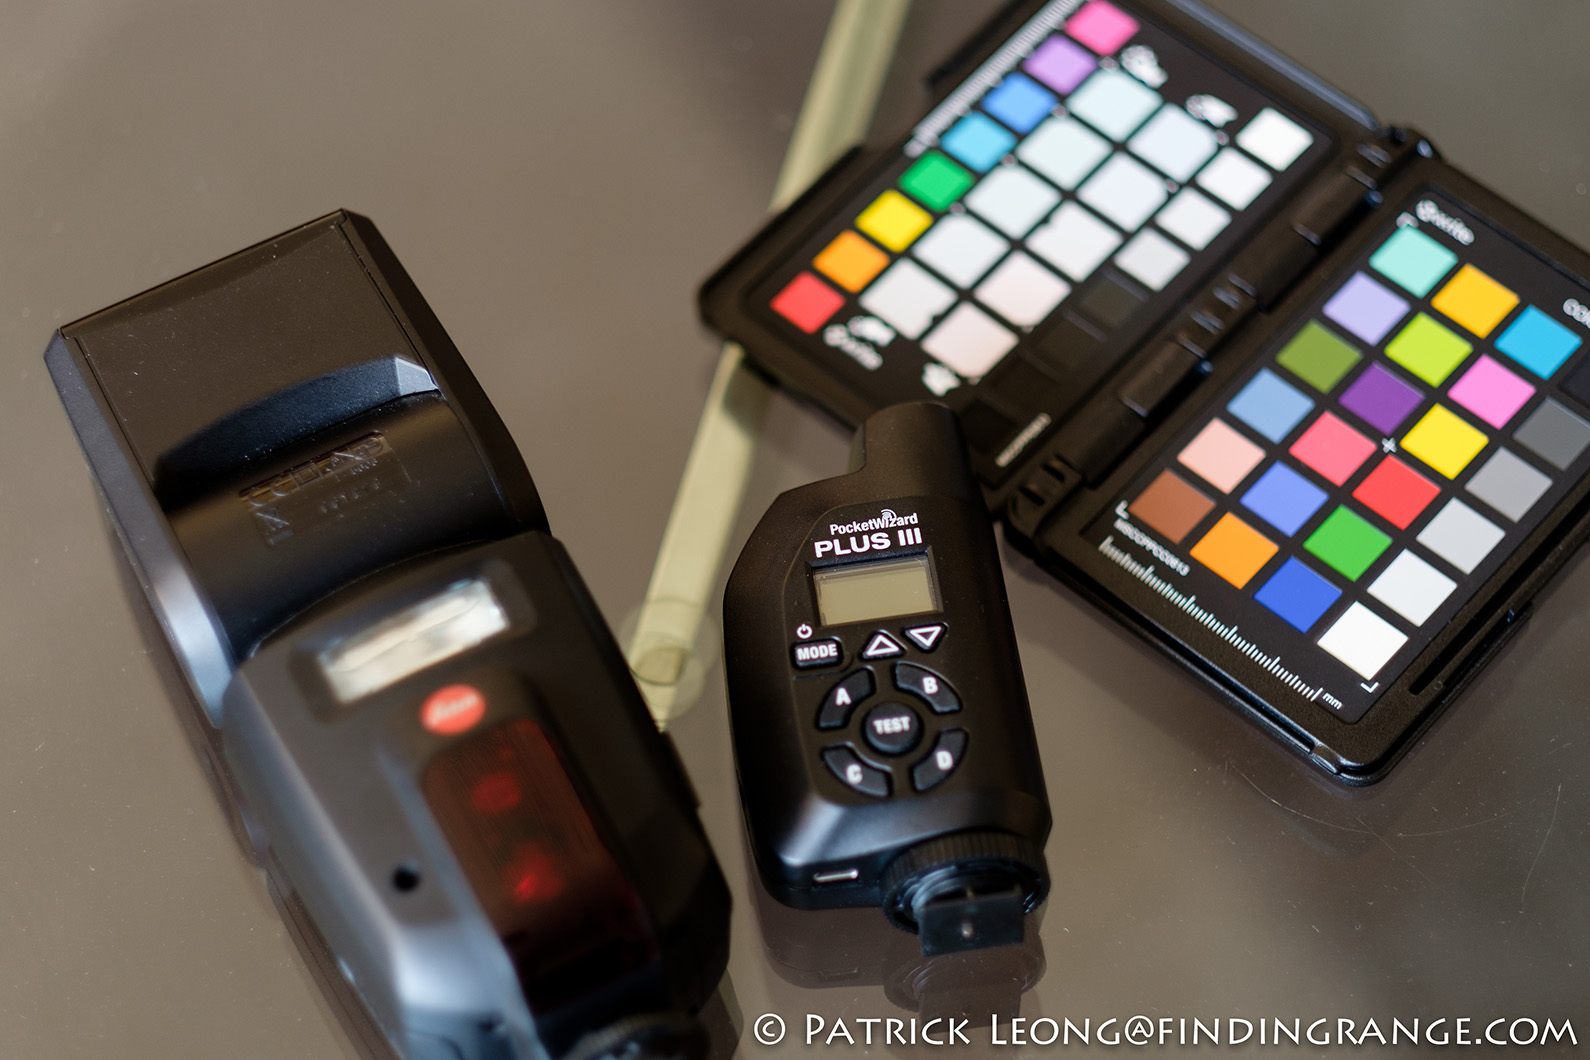 Leica-SF-58-Flash-Pocket-Wizard-X-Rite-Color-Checker-Passport